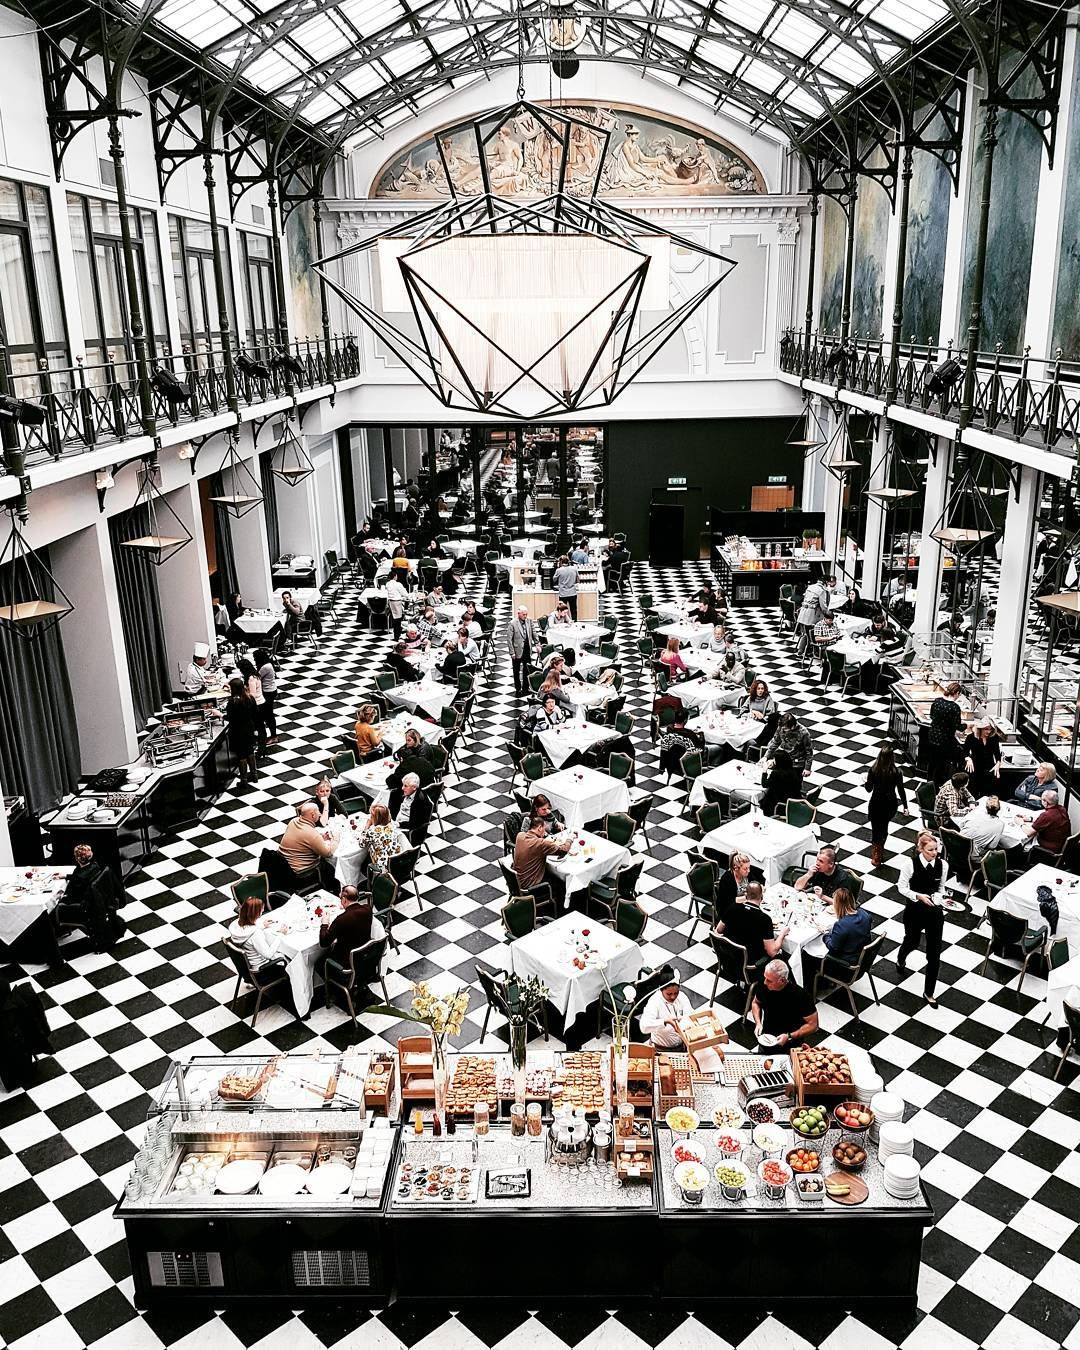 amsterdam hotel nh grand hotel krasnapolsky winter garden